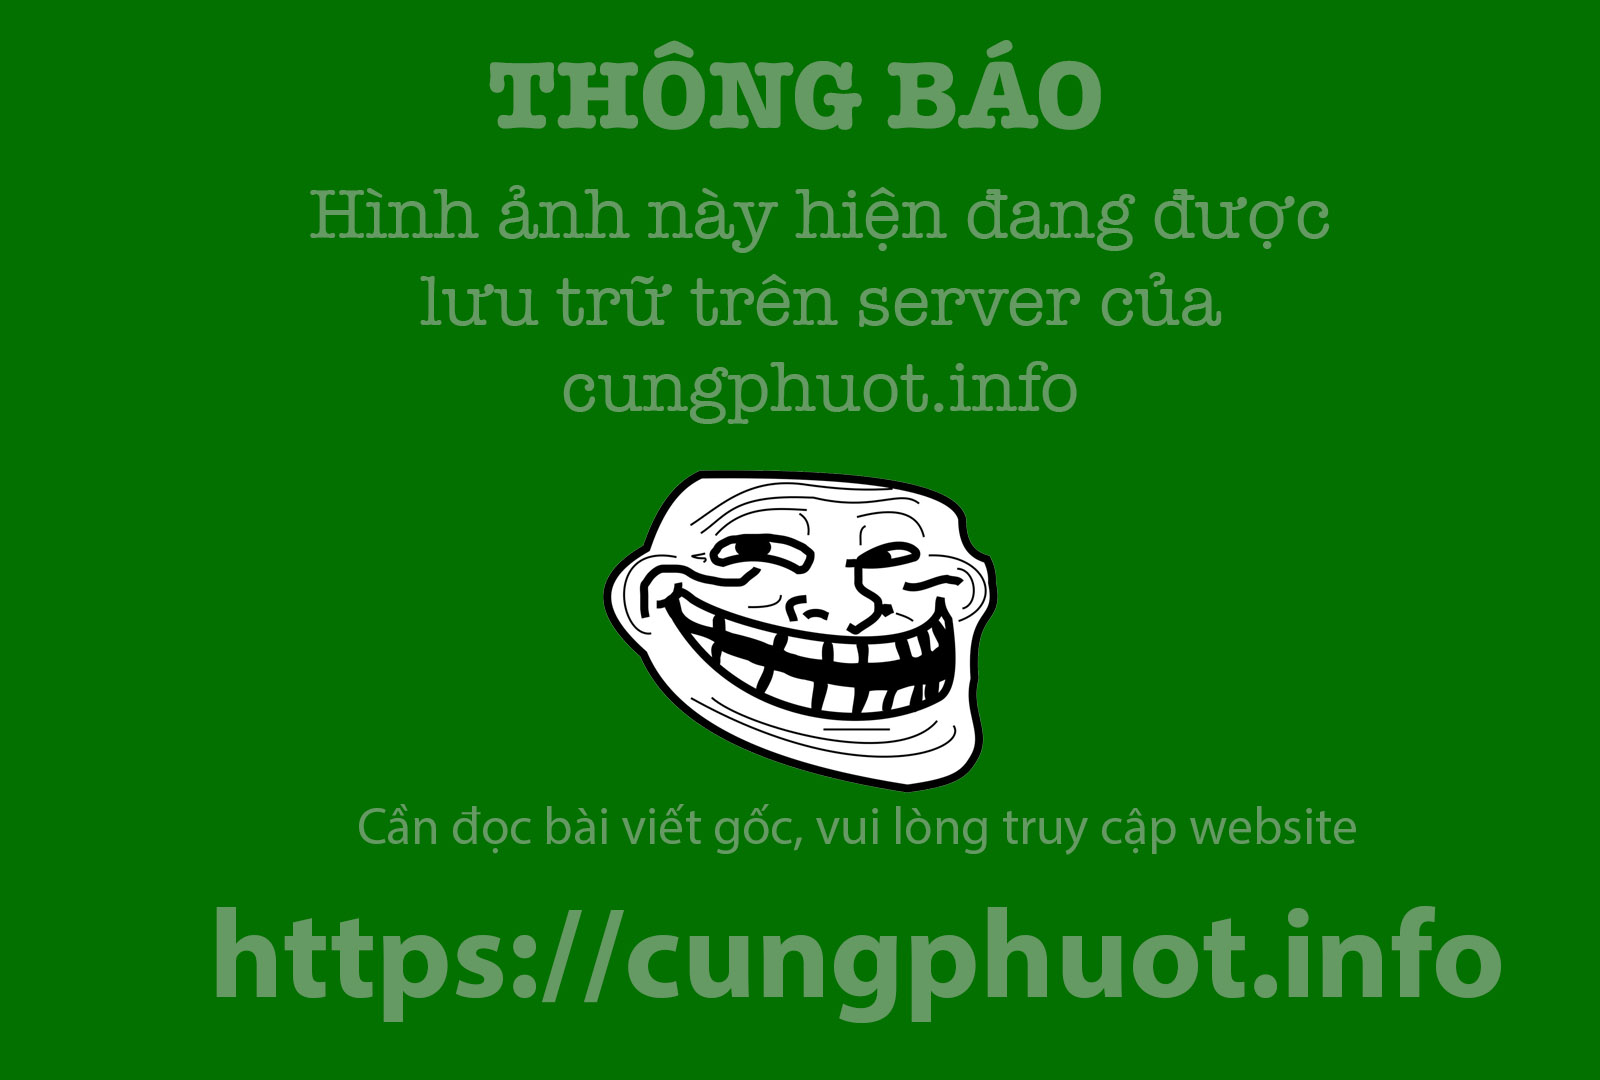 Chon bien cuong 'troi thap, dat cao' o Nam Can hinh anh 6